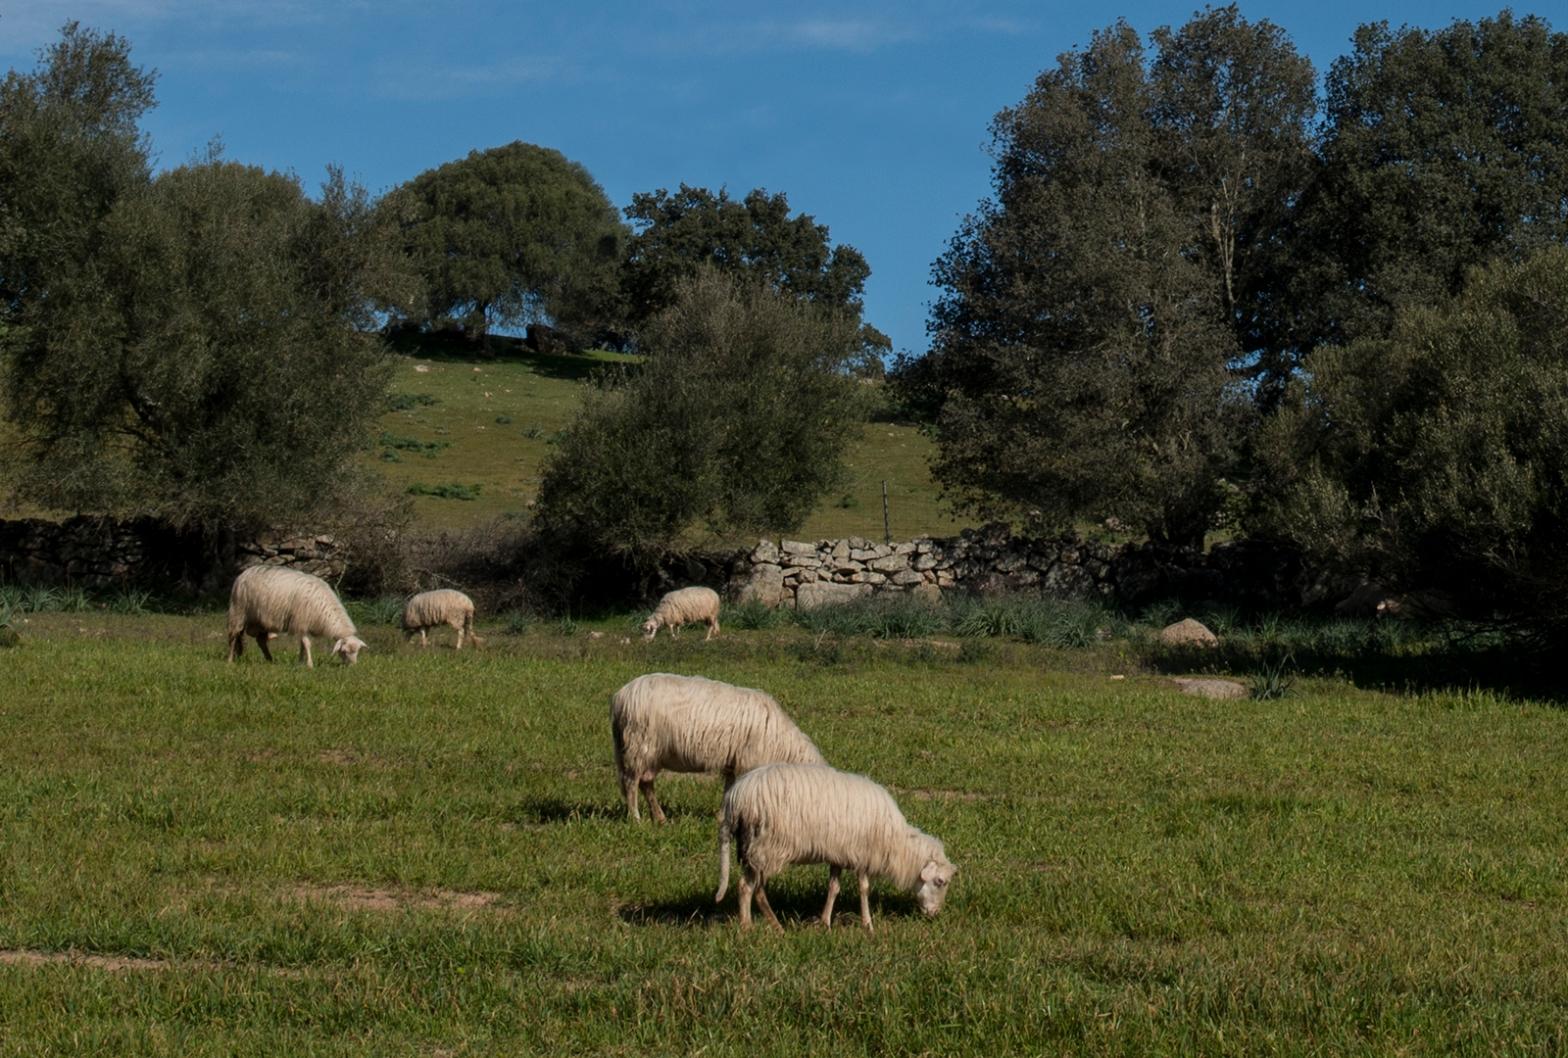 Sardinian sheep grazing